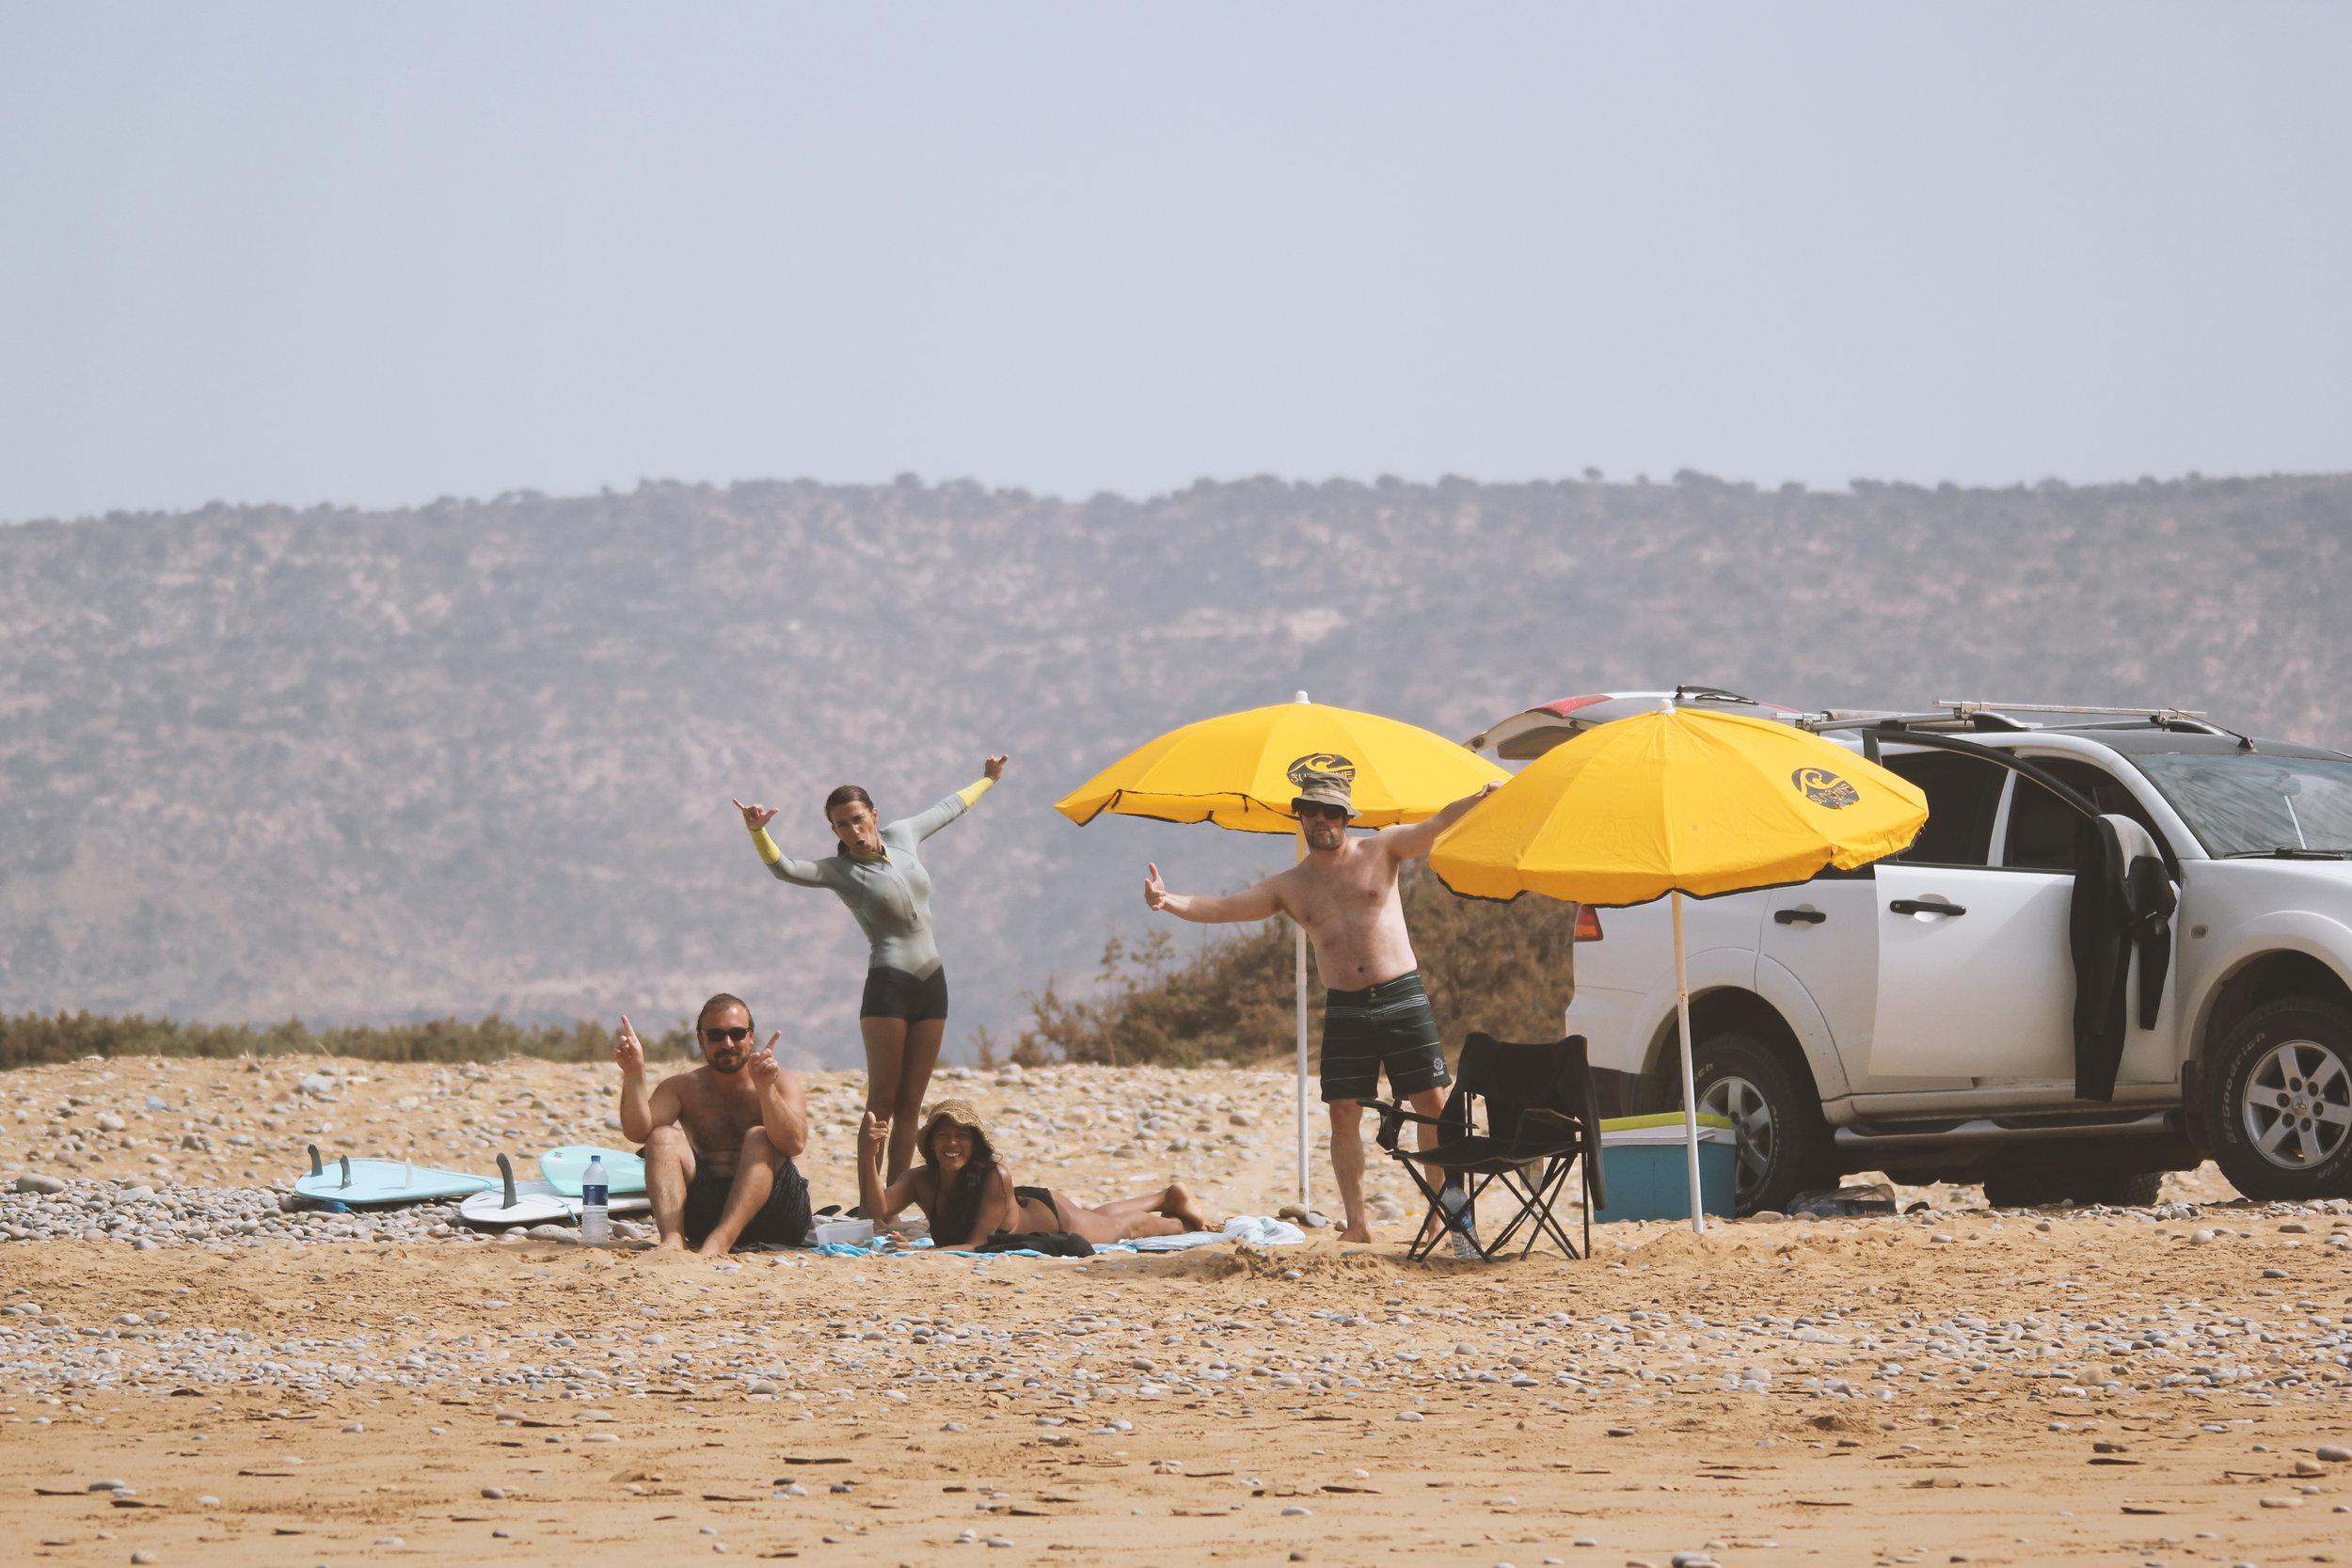 soa_surf_trips_marruecos_noviembre_02.jpg